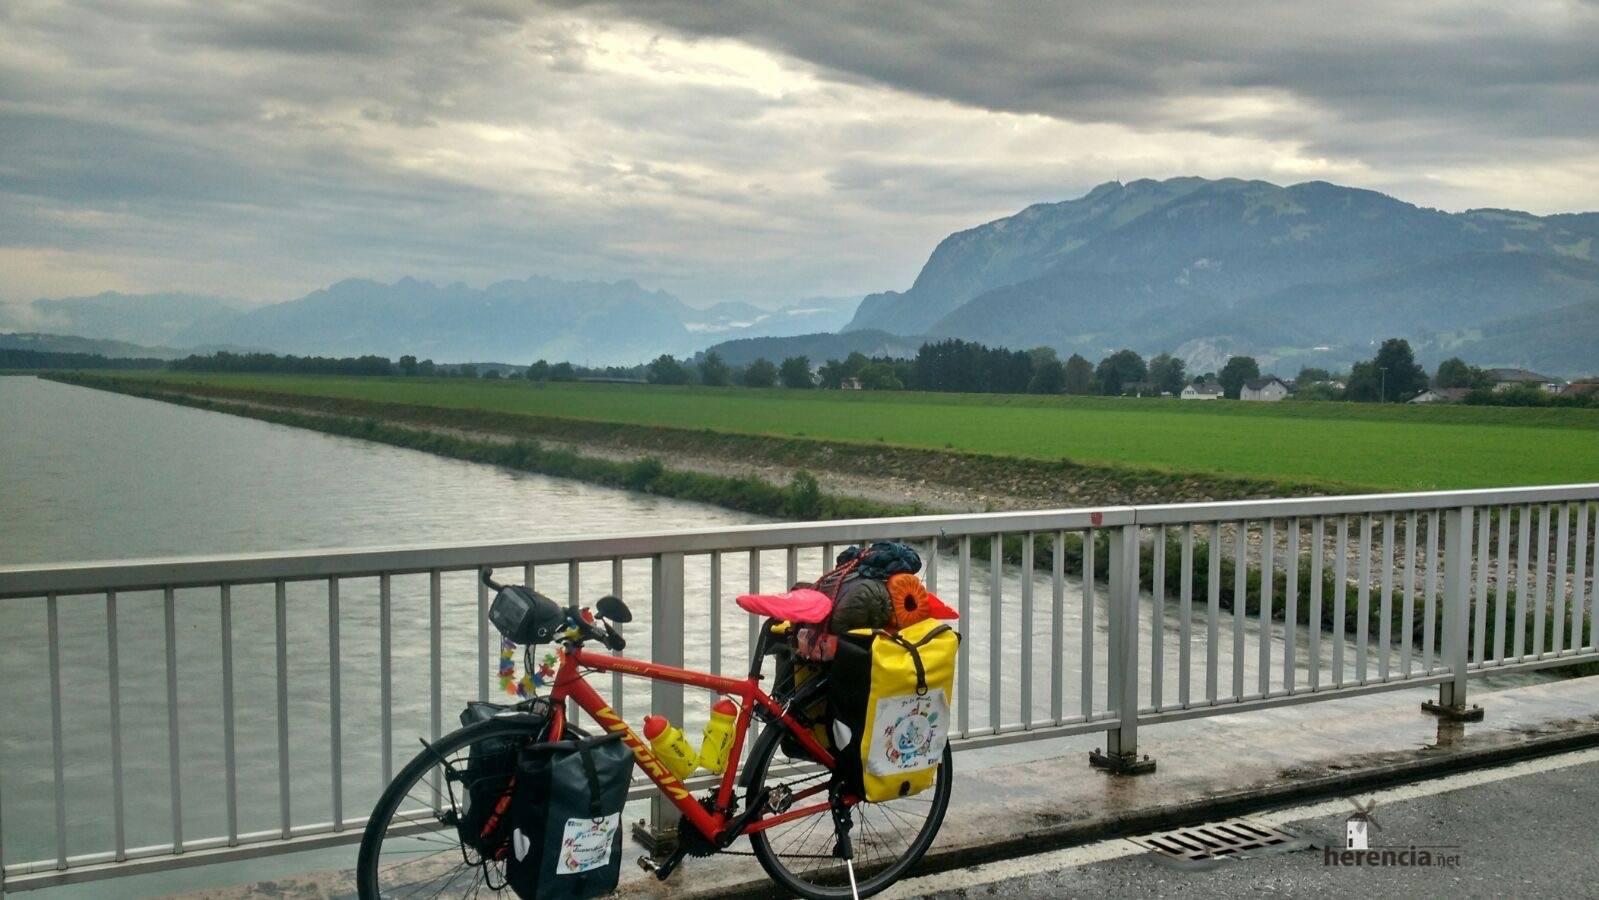 Etapa 33 Perlé en Austria09